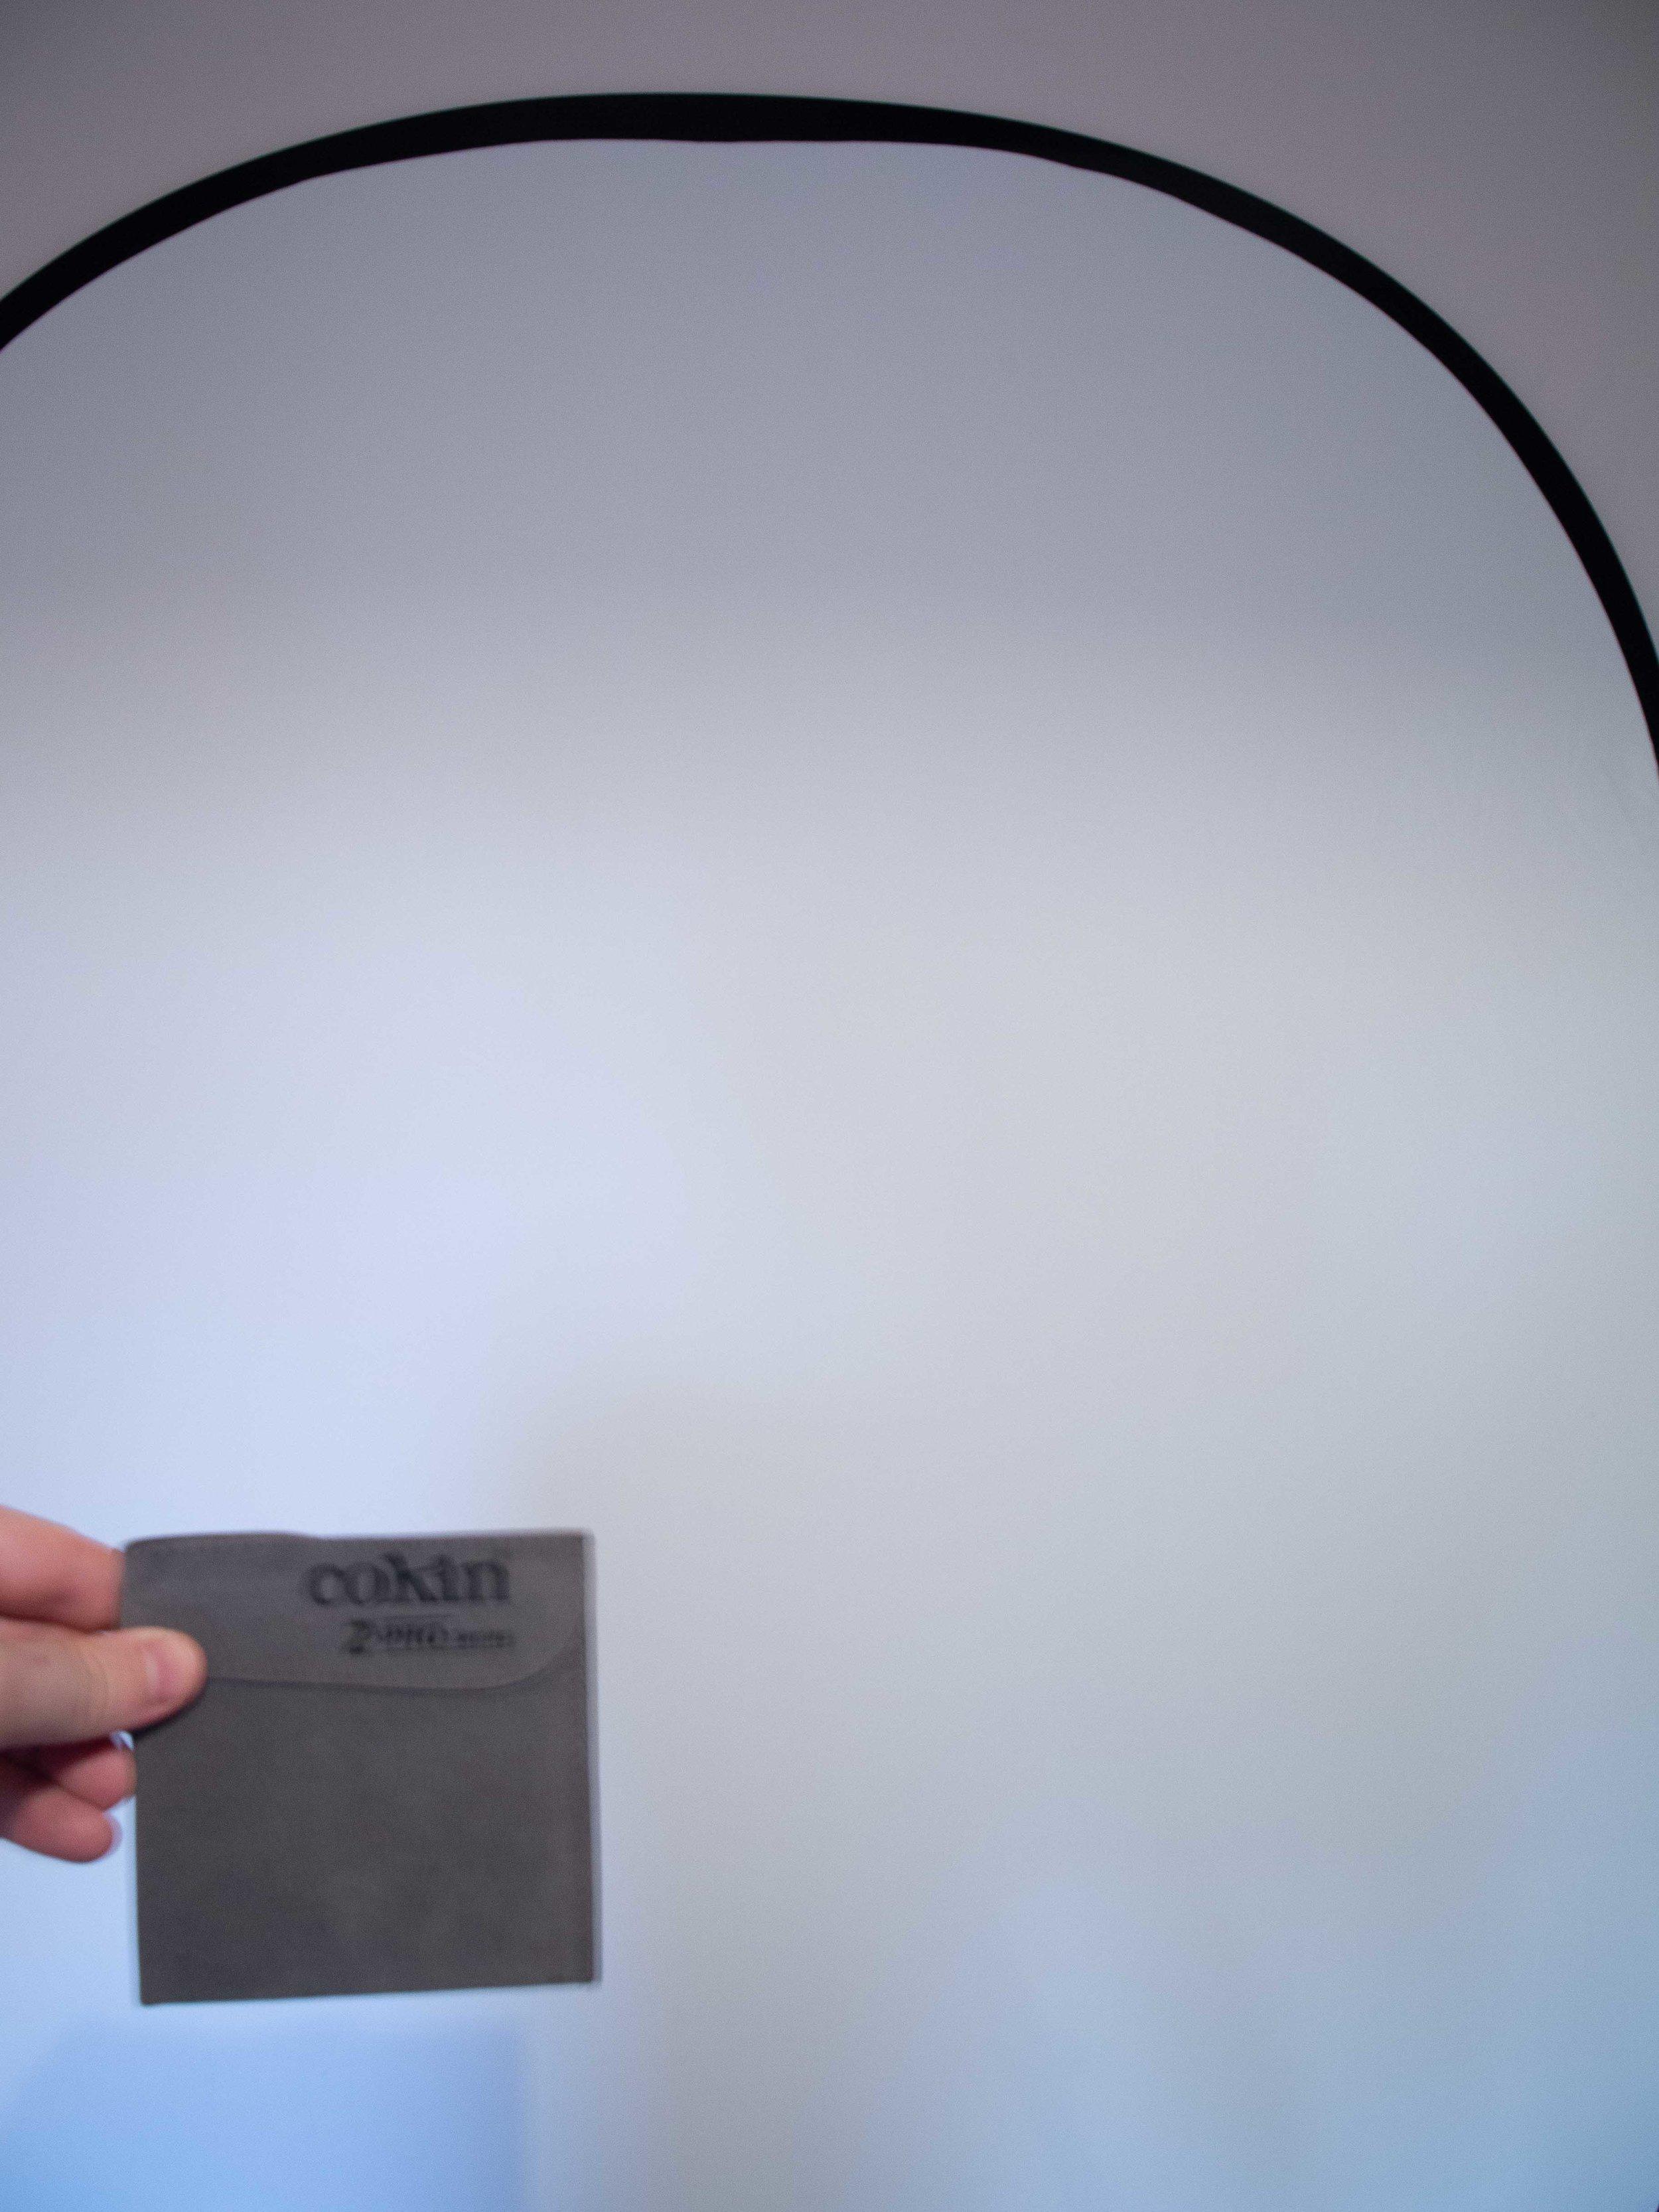 Filter Test Cokin vs 84.5mm (1 of 6).jpg